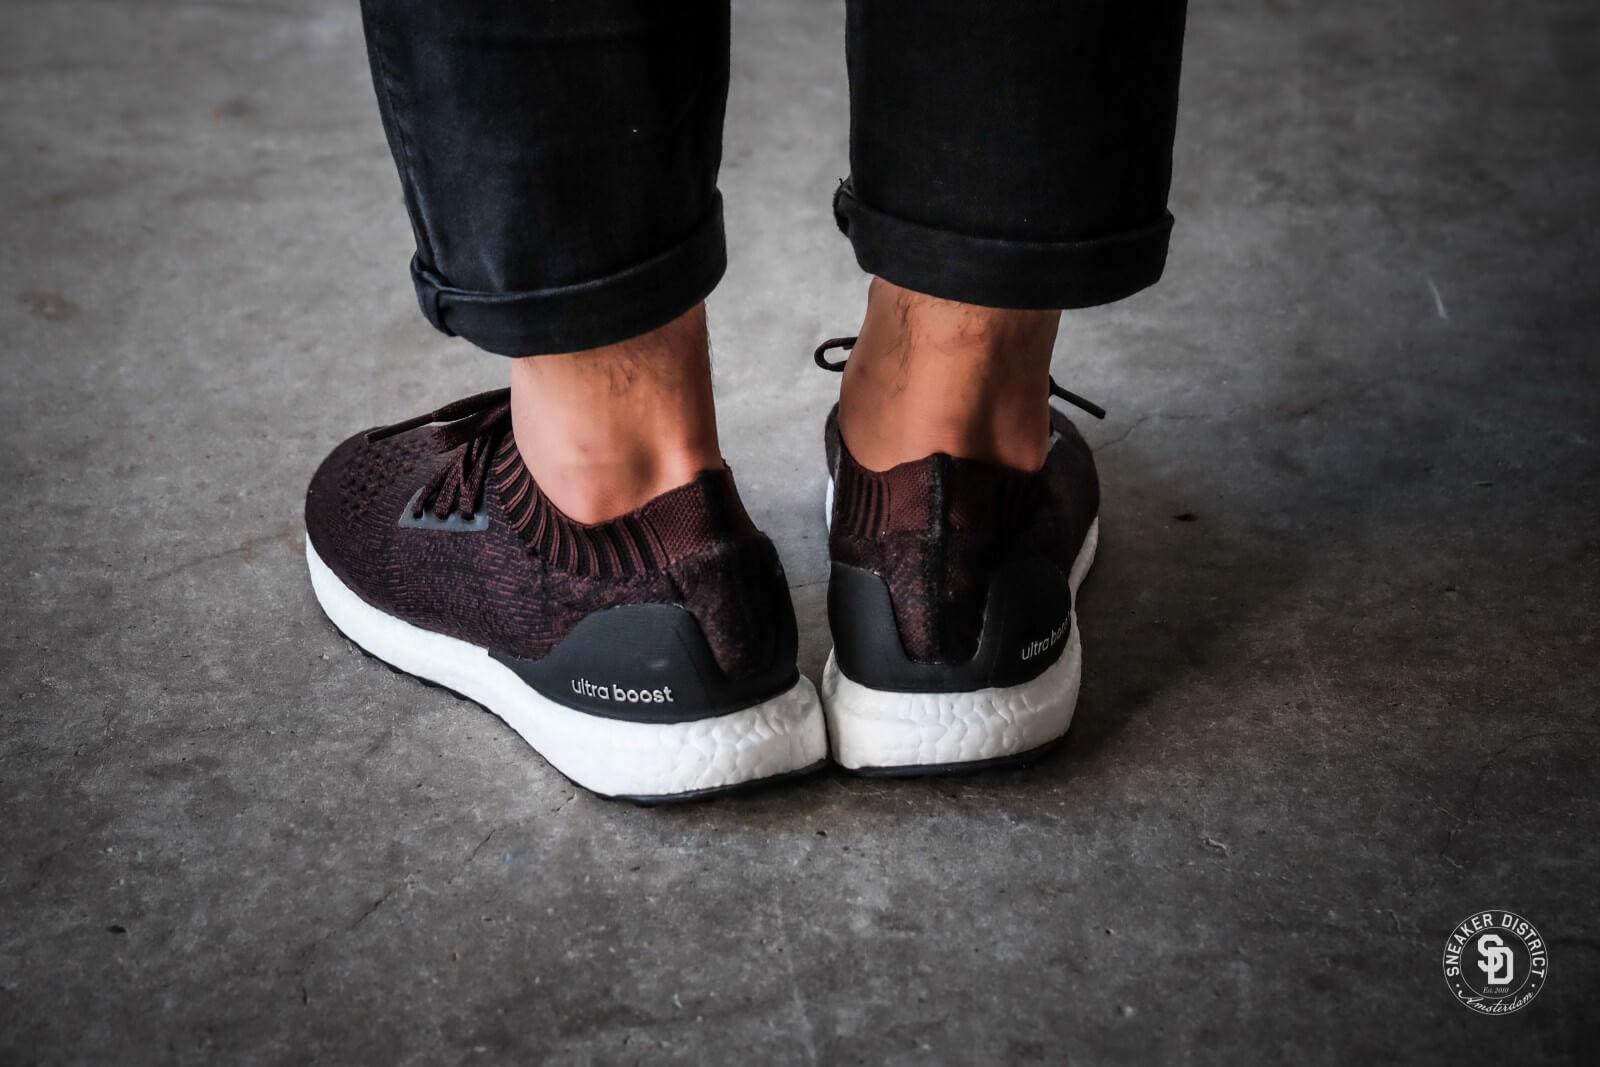 Adidas Menns Ultra Boost Uncaged Joggesko - Svart / Mørk Burgunder g3ECQBX